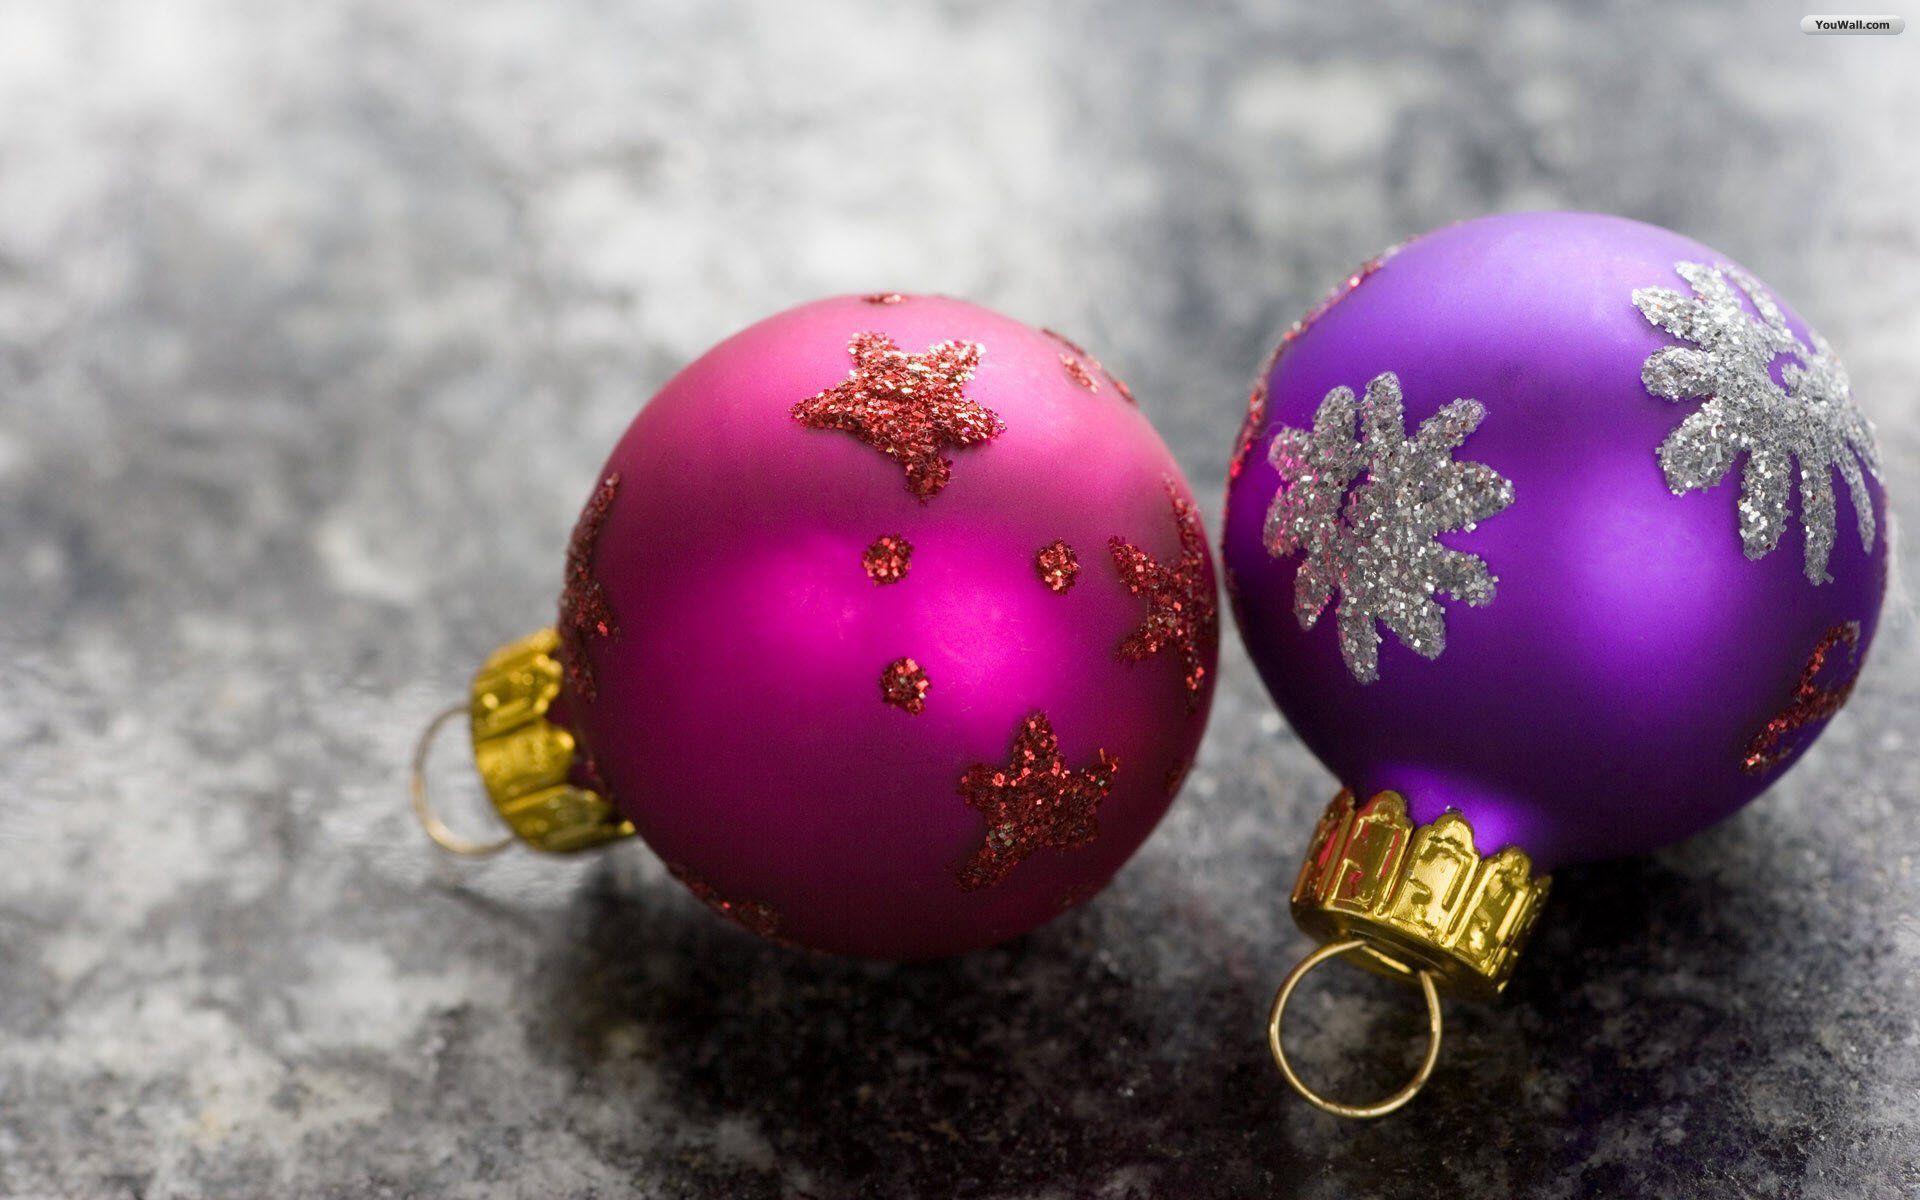 Christmas Ornaments Wallpaper | Sky HD Wallpaper